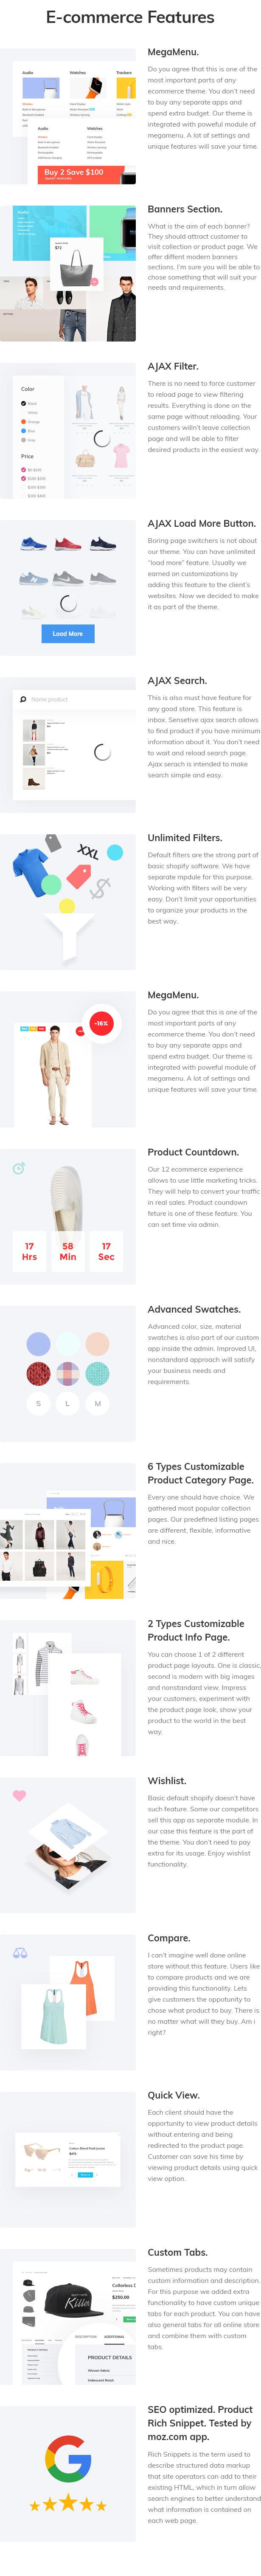 MOGO - eCommerce features